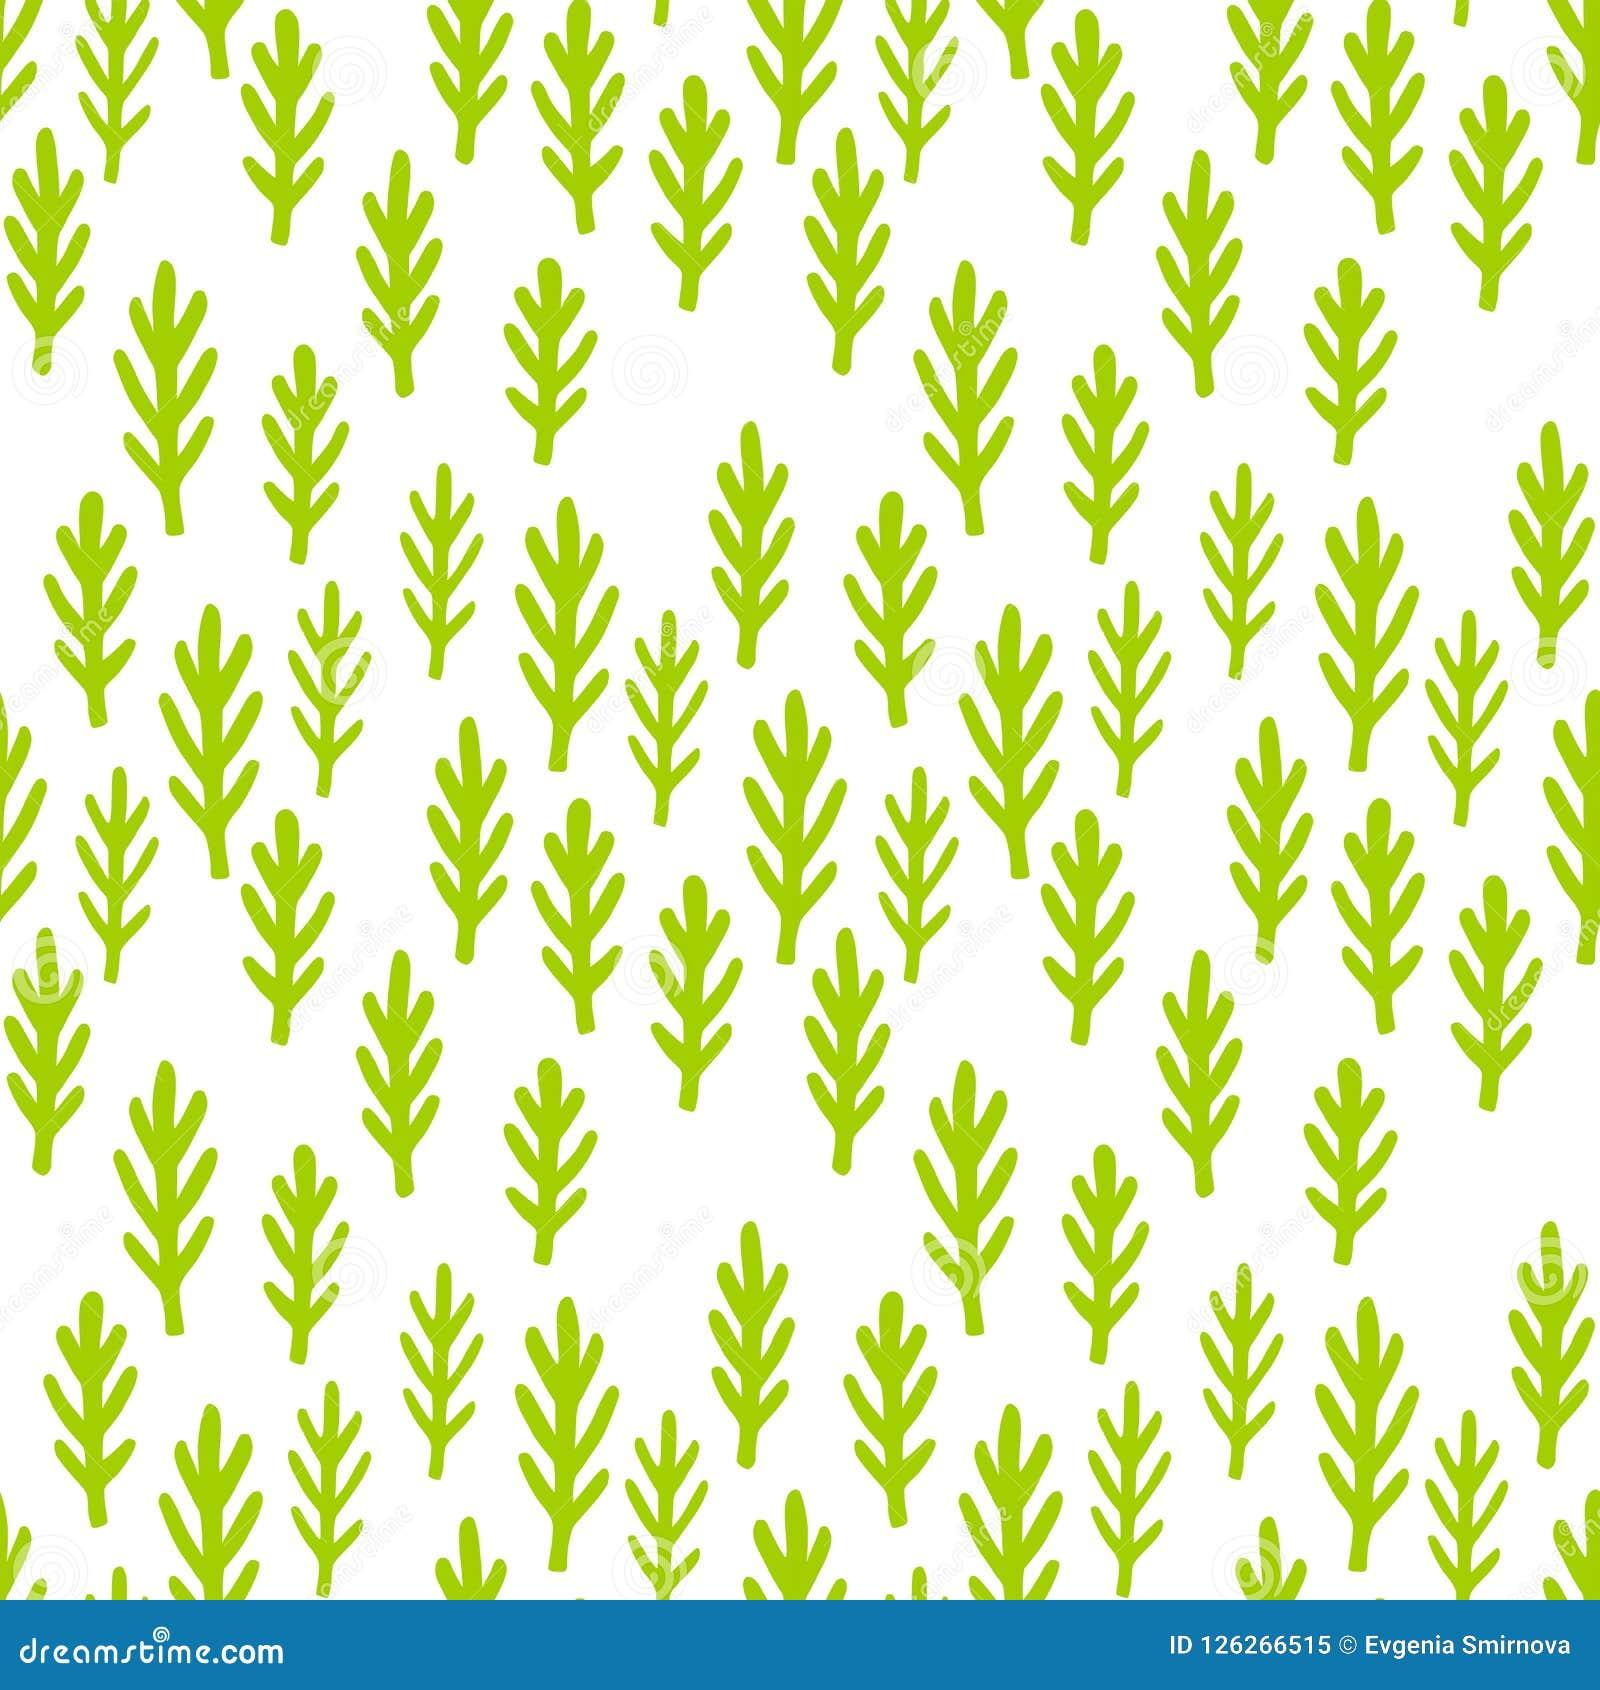 Child Drawing Cute Plants Grass Seamless Pattern Green